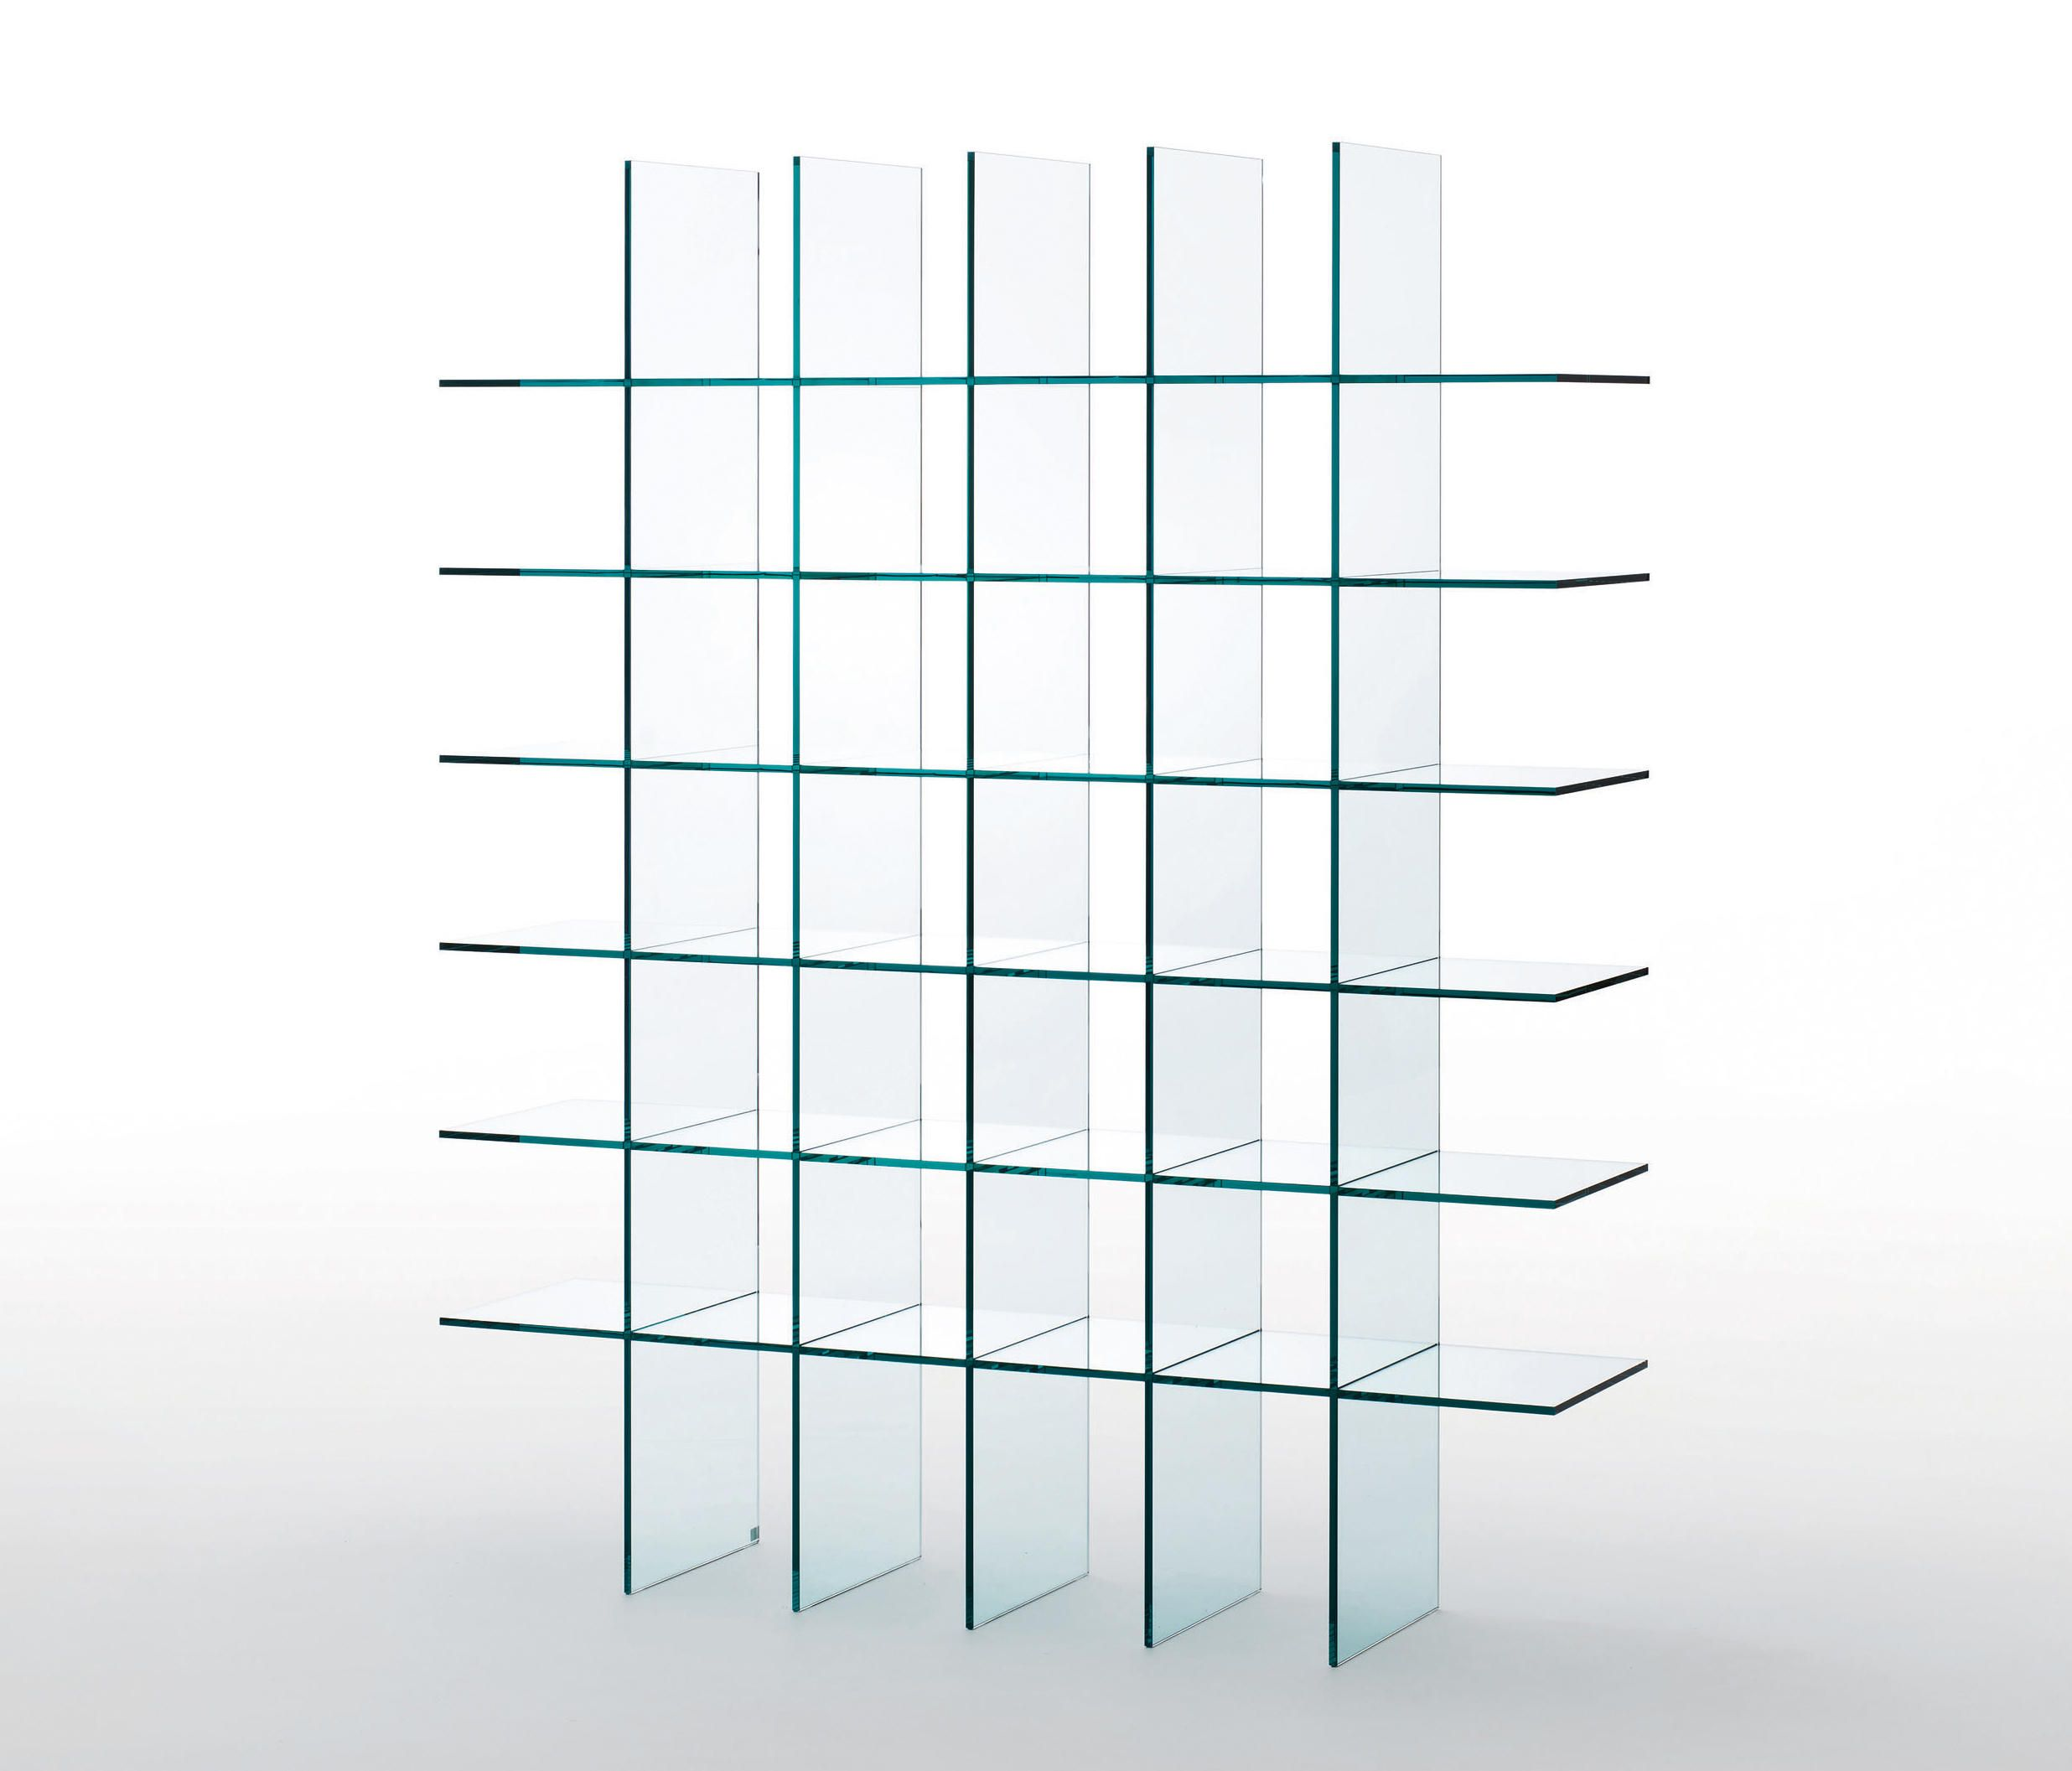 Glass Shelves 1 Designer Shelving From Glas Italia All Information High Resolution Images Cads Catalogues Glass Shelves Glass Shelves Kitchen Glass